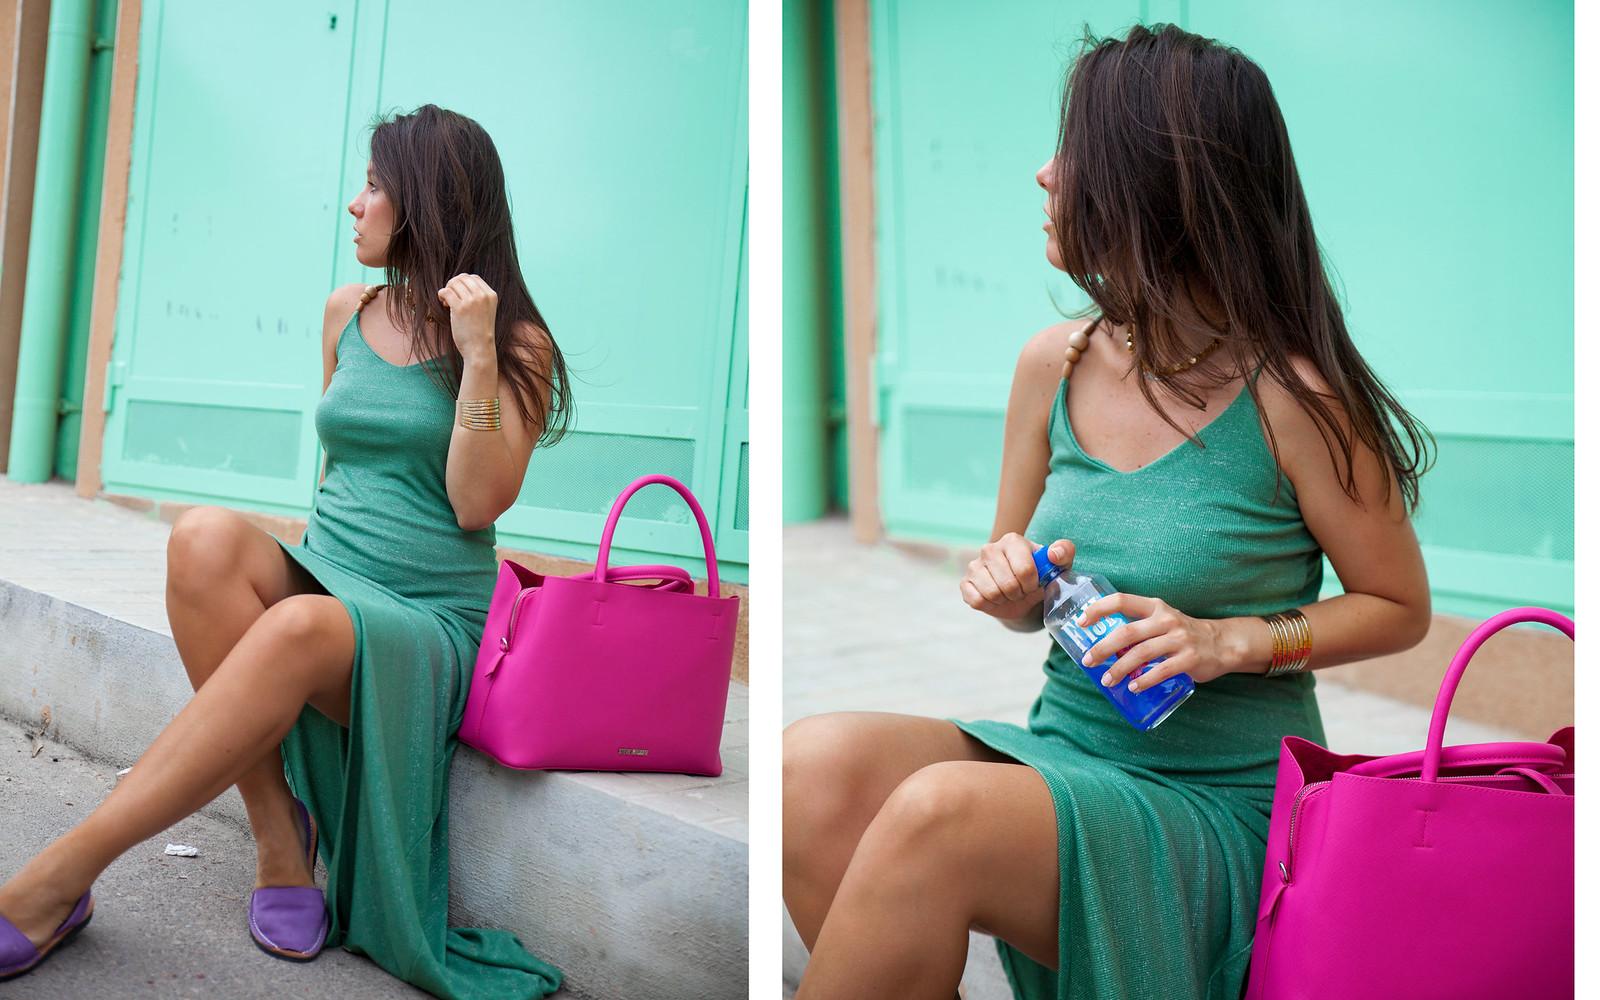 05_Vestido_turquesa_largo_outfit_embarazada_influencer_barcelona_theguestgirl_pregnant_blogger